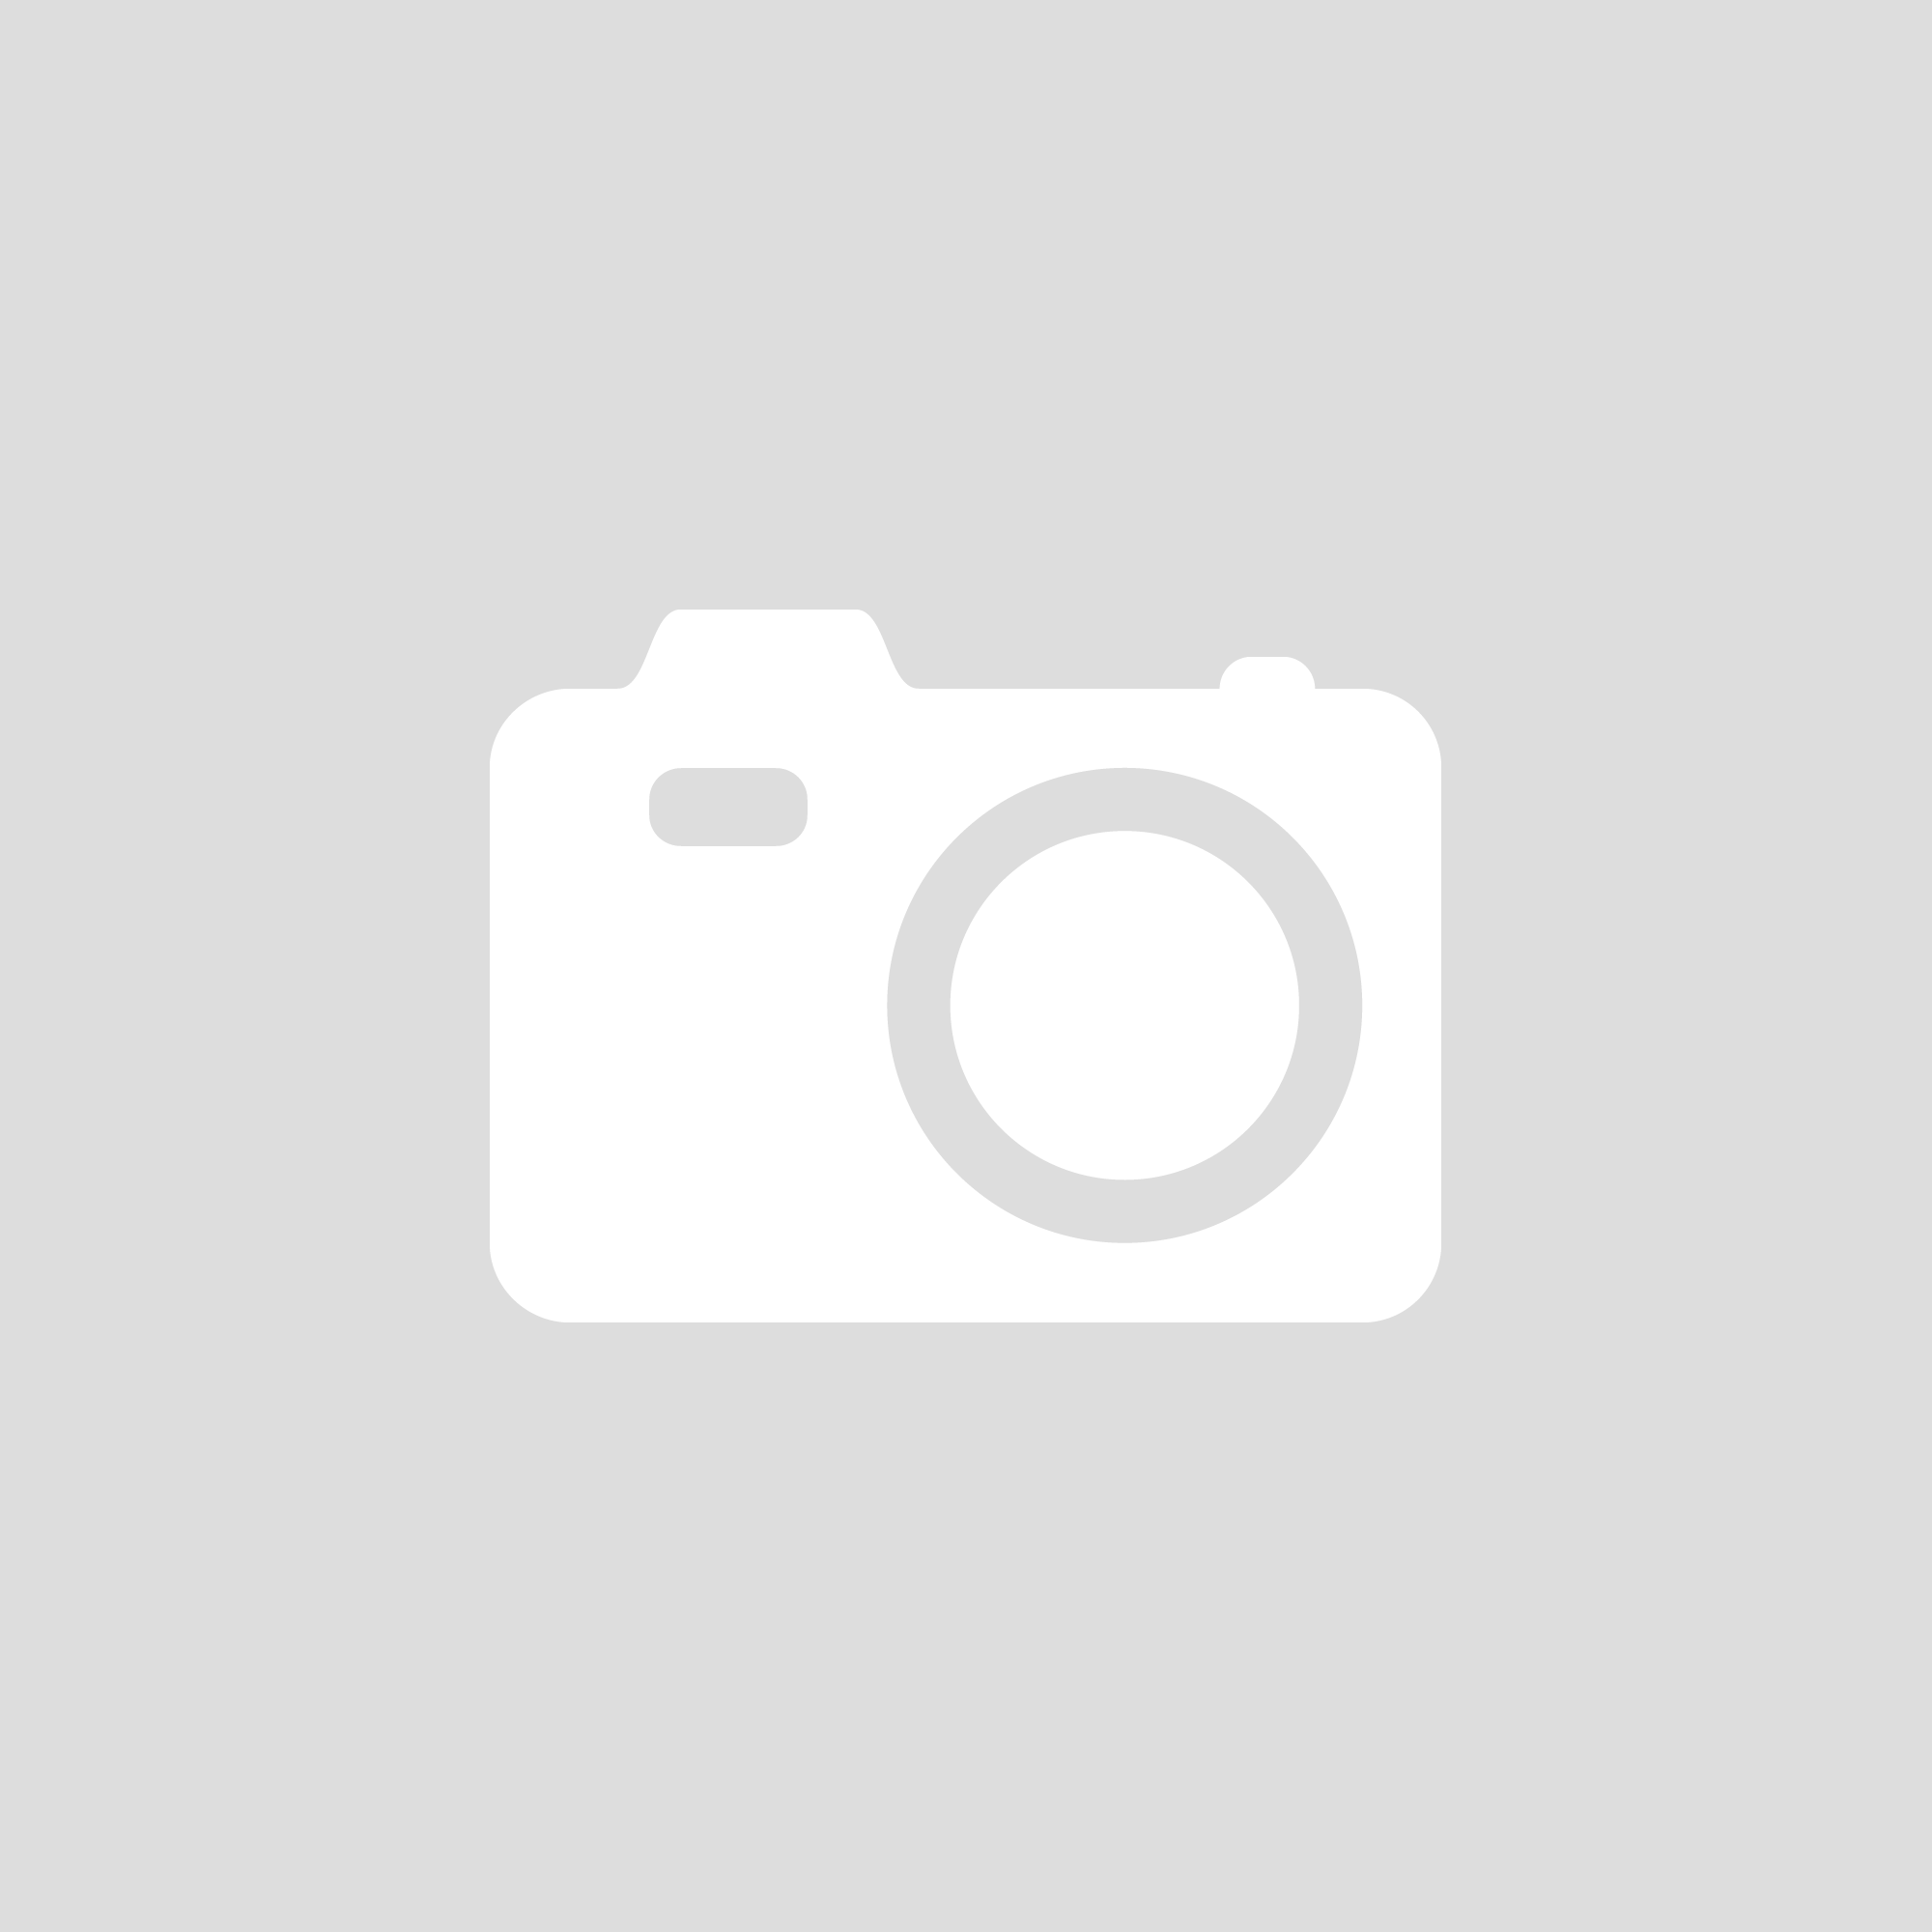 Tiles & More Vintage Cutlery Gold / Cream Contour Wallpaper by Rasch 828115